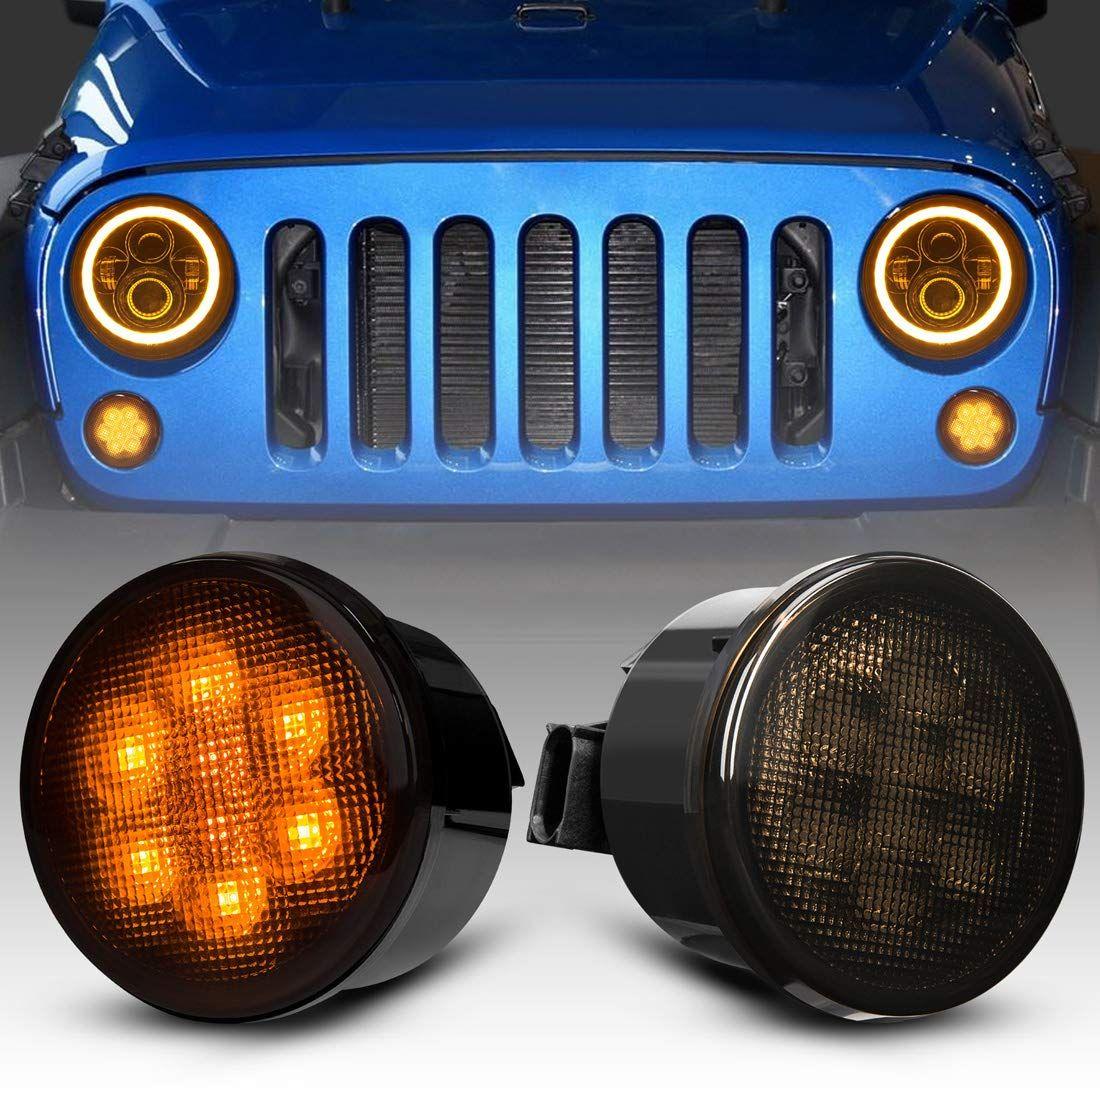 Ahumado a su vez condujo semáforos de lentes para 2007-2018 Jeep Wrangler JK Indicador JKU Frente Parrilla Plaza de bengalas guardabarros del lado Blinker luces marcadoras